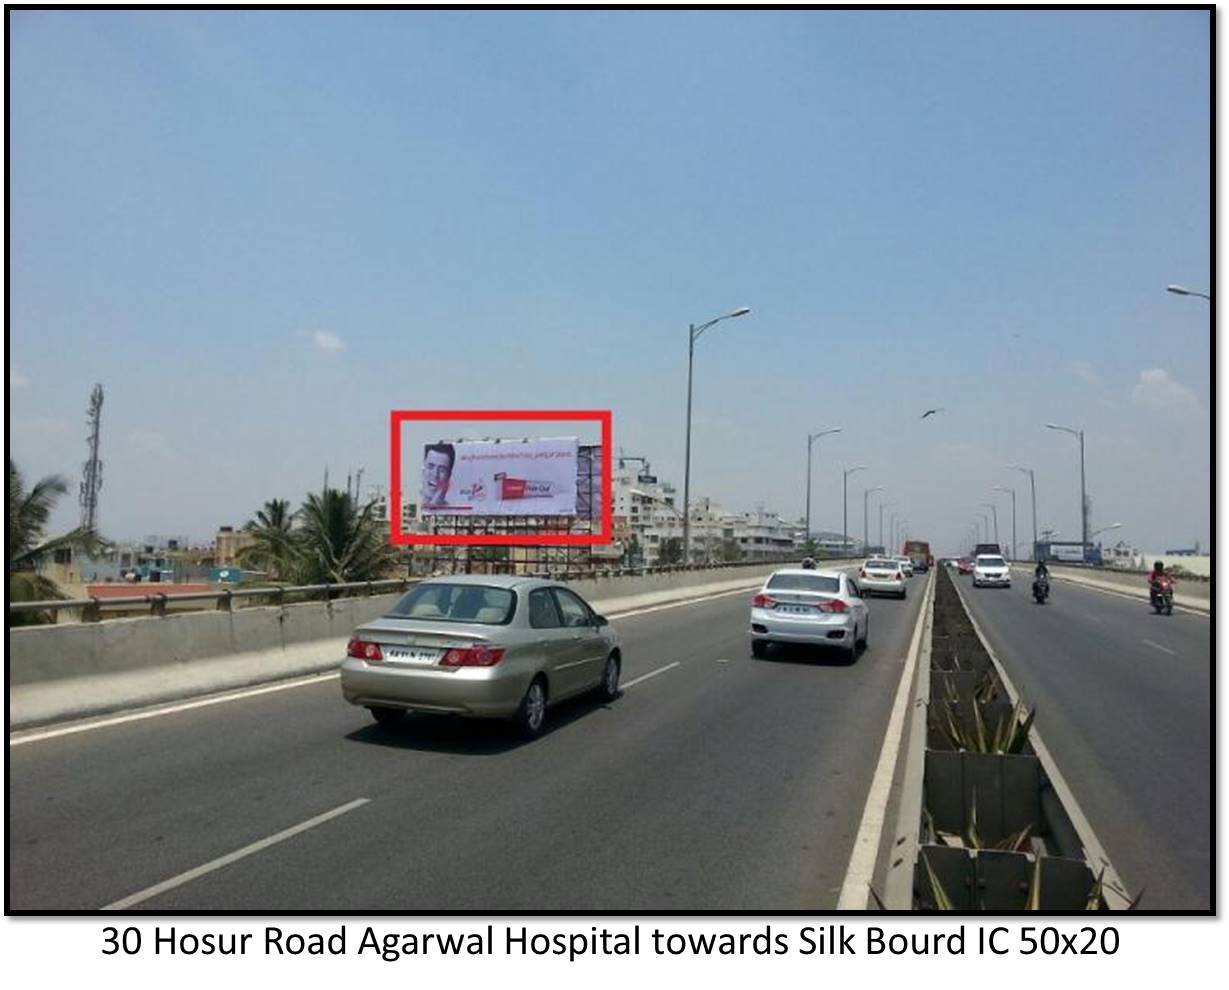 Hosur Road Agarwal Hospital, Bengaluru